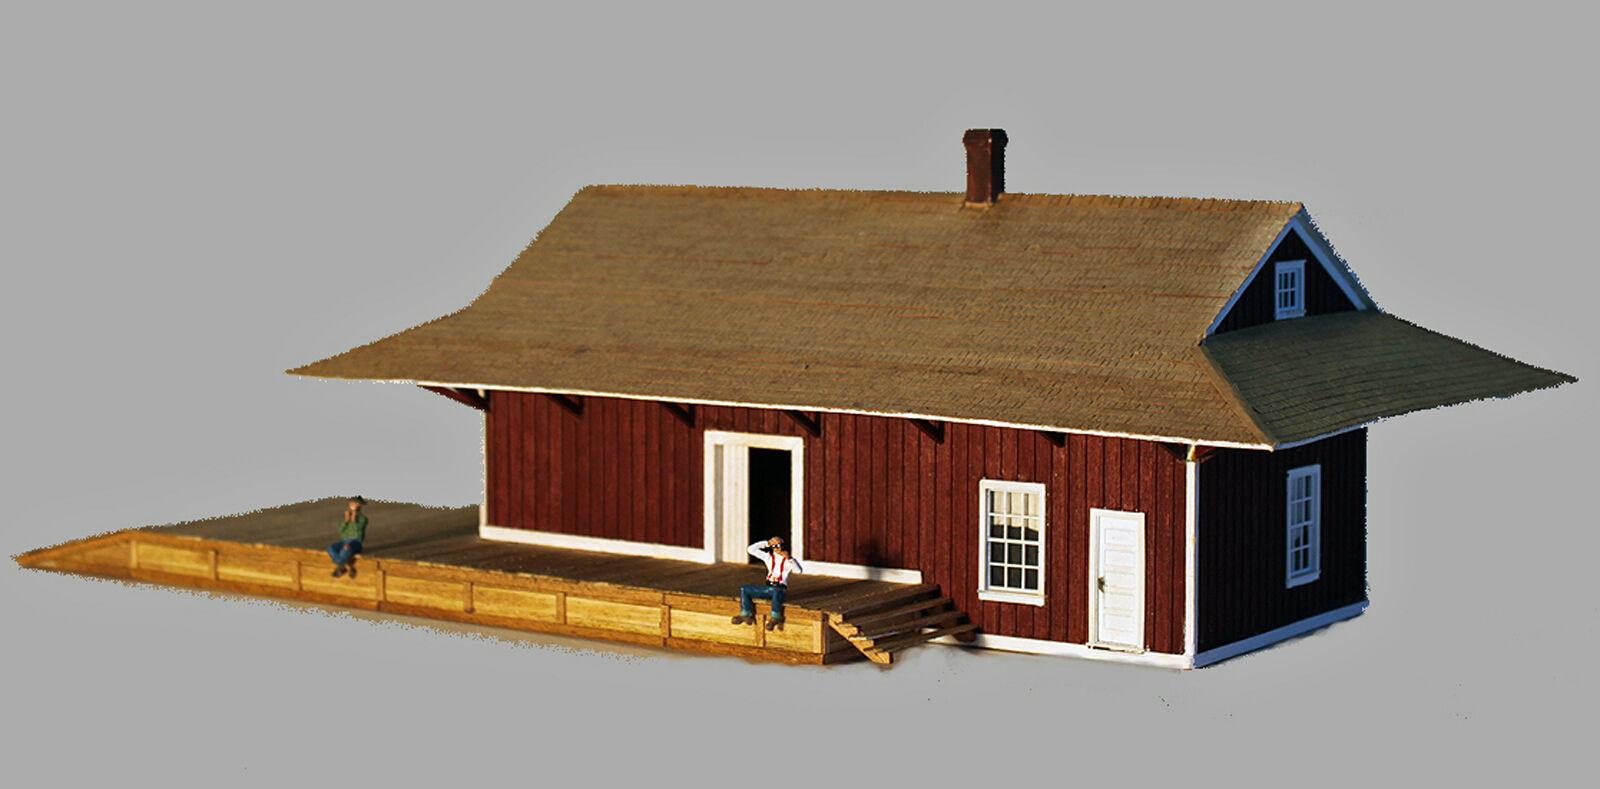 KEARSARGE DEPOT HO Model Railroad Structure Craftsman Unpainted Wood Kit CM31417